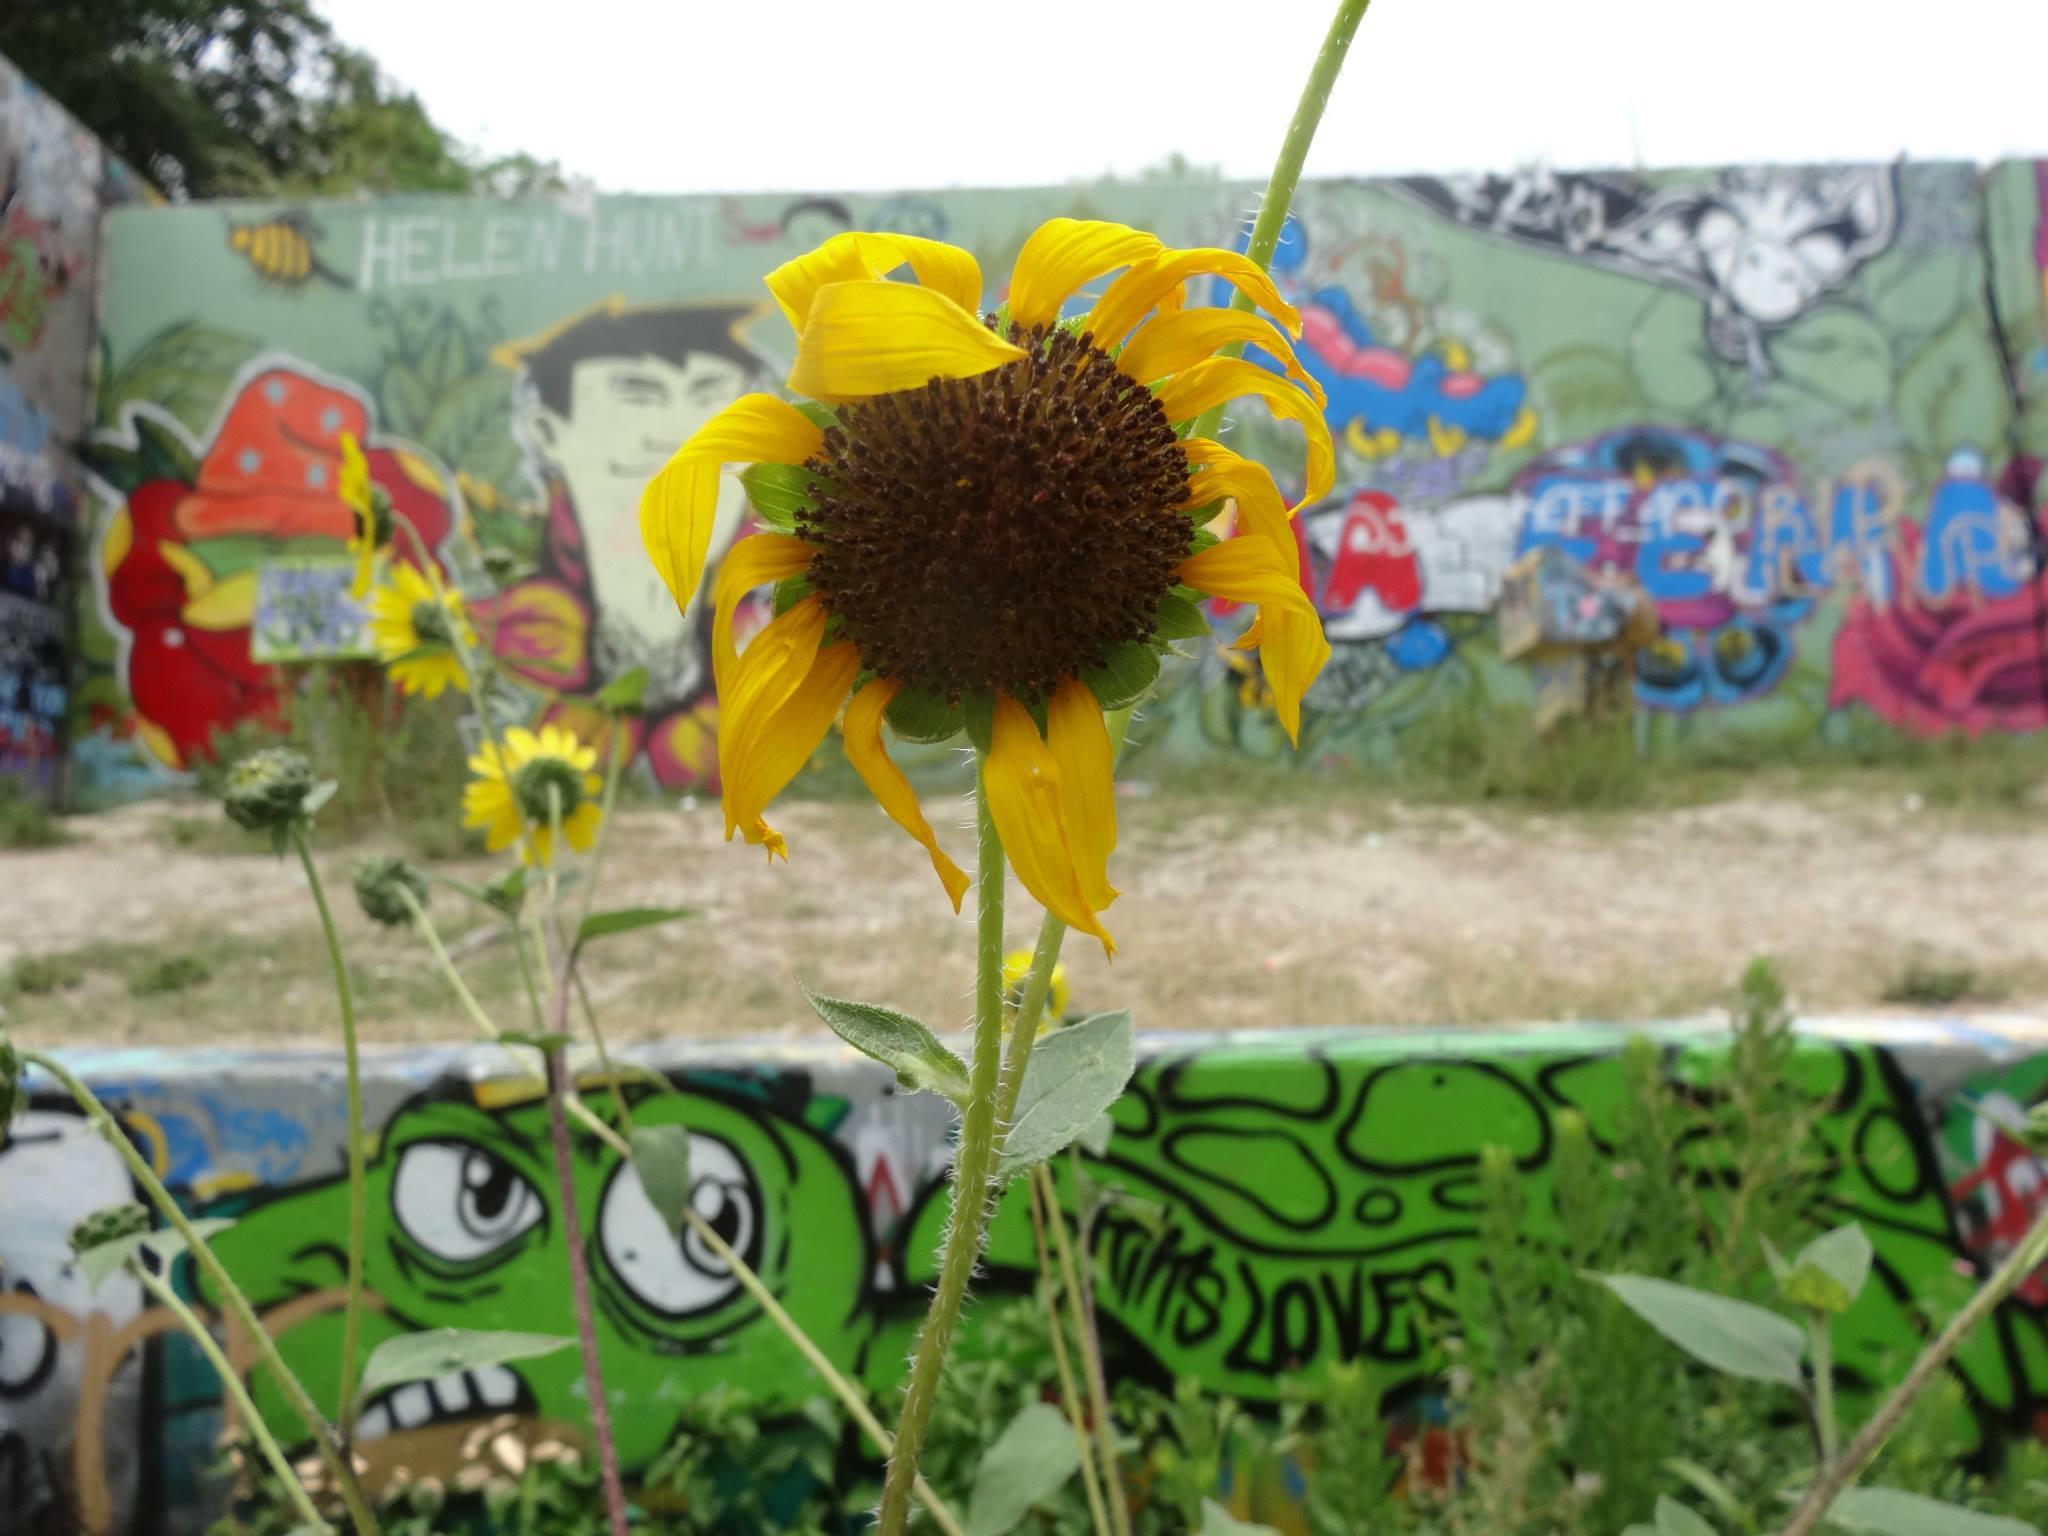 sunflower and graffiti art in Austin